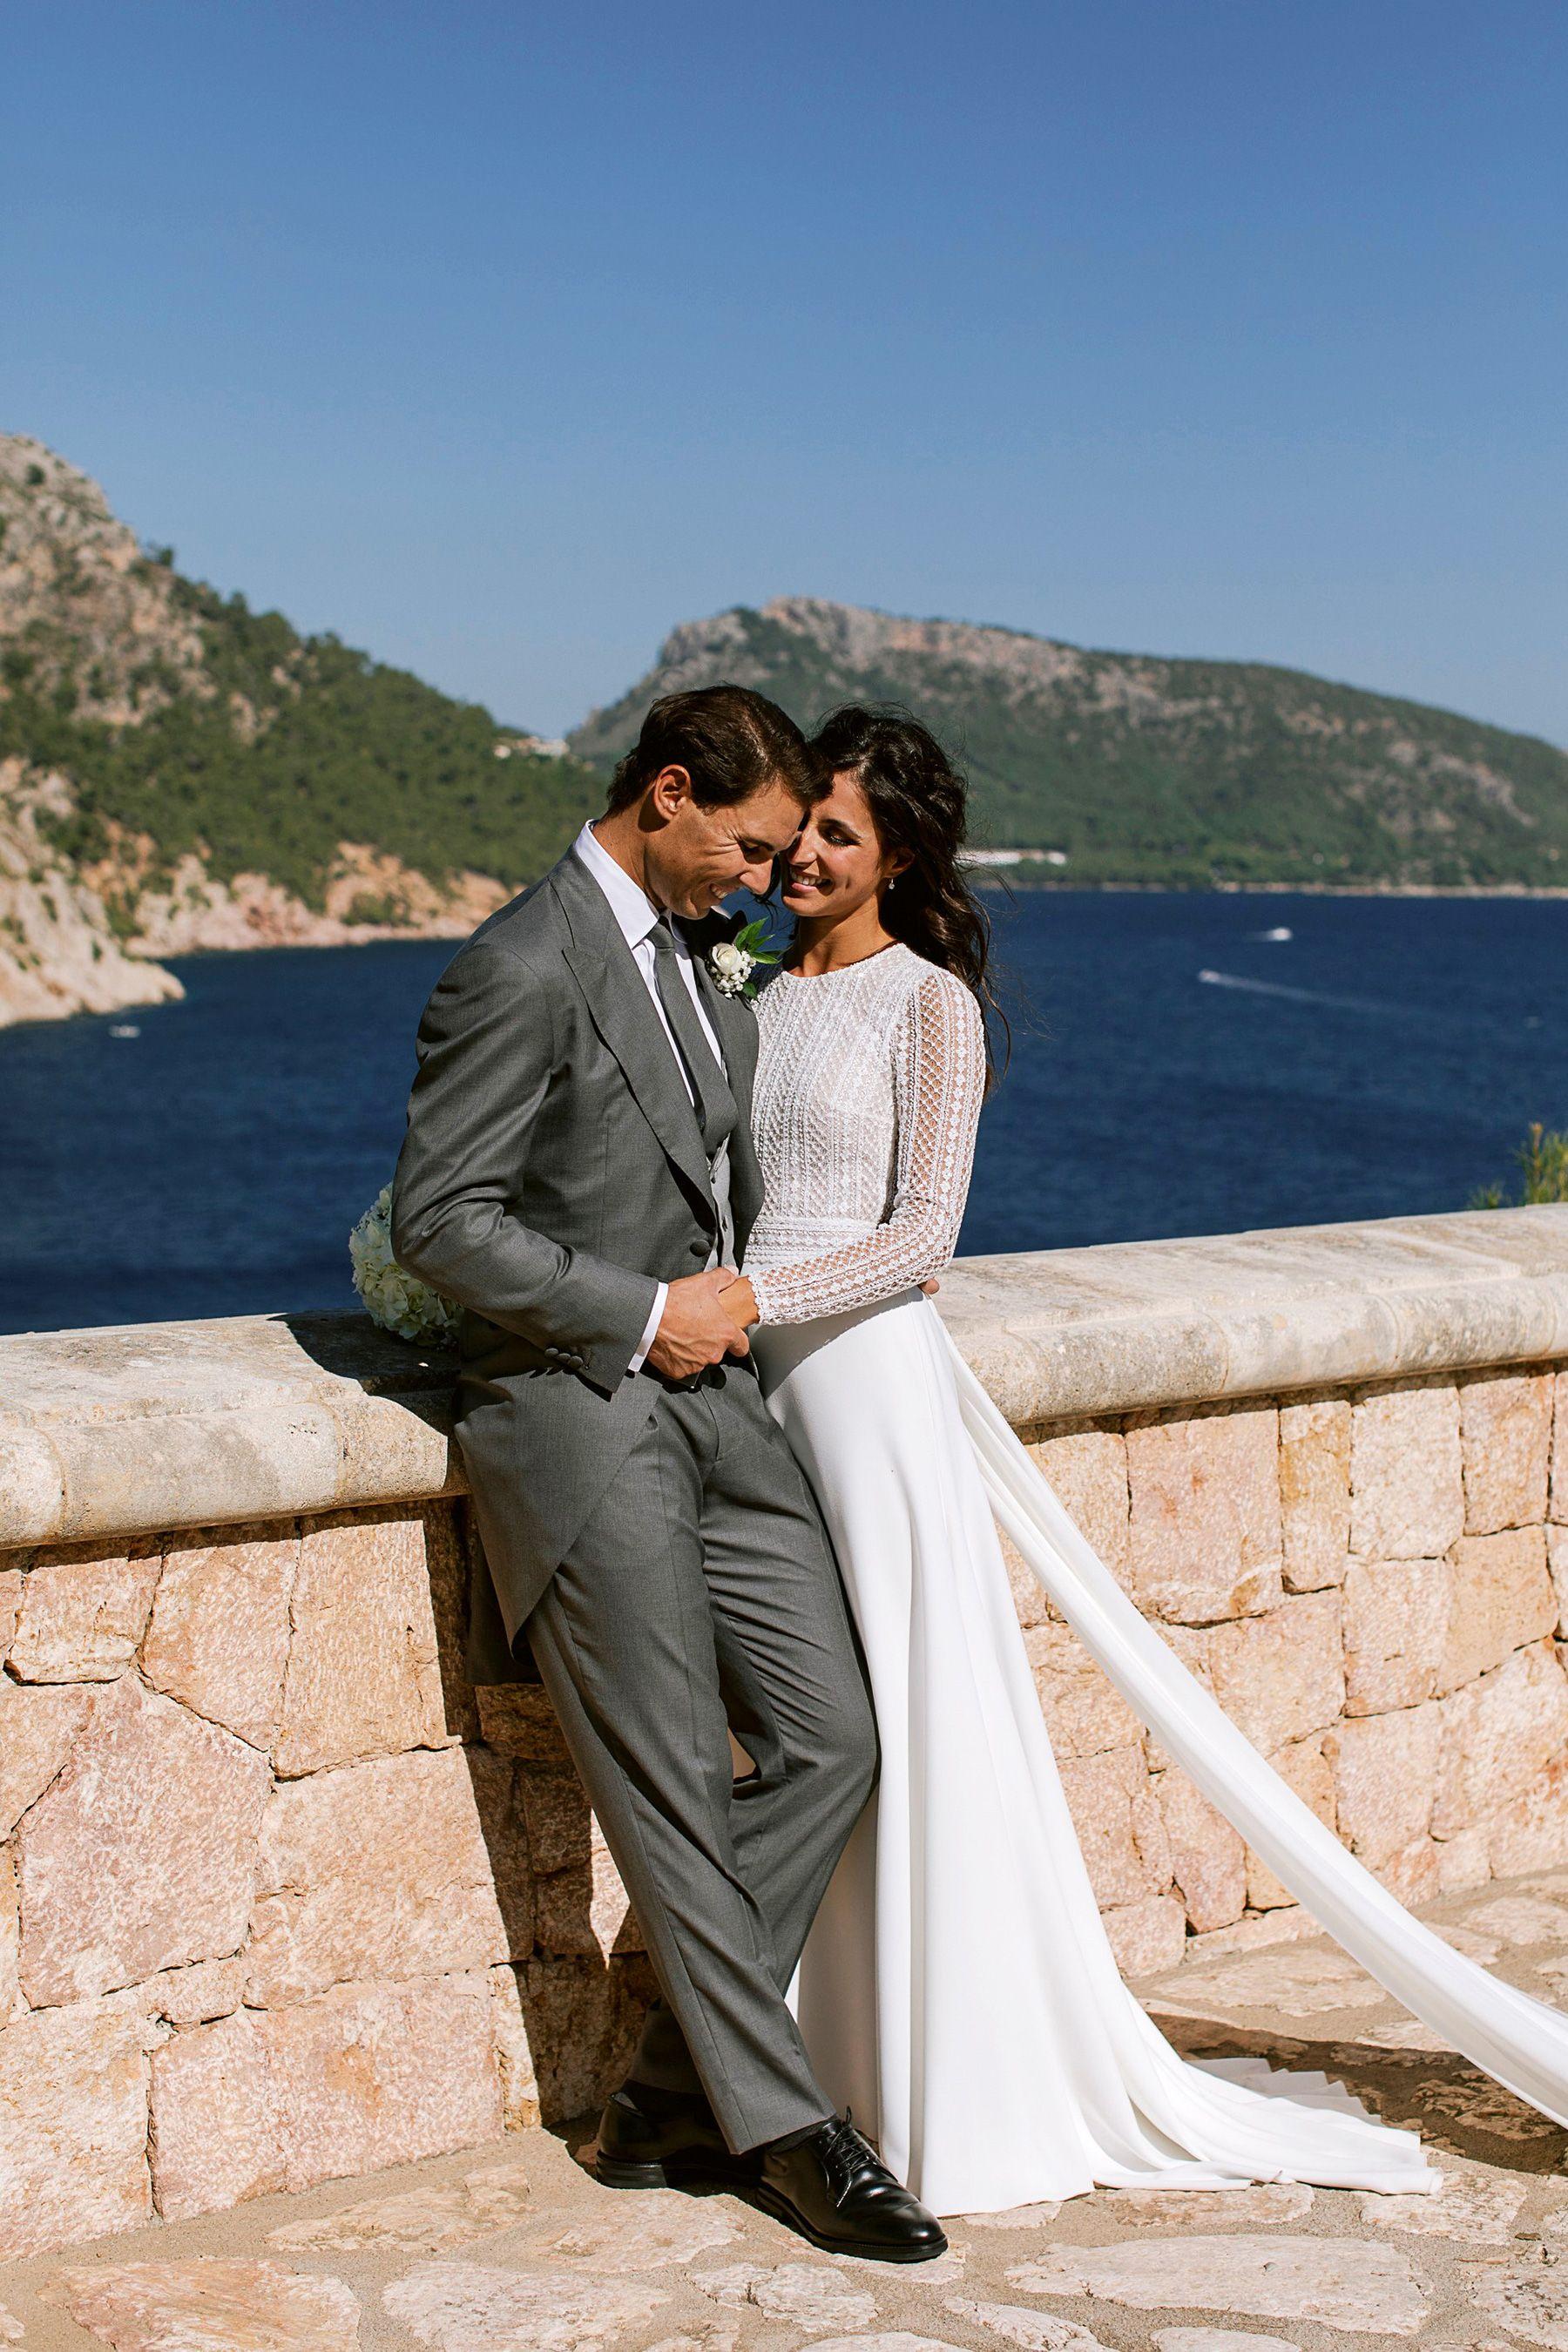 See Rafael Nadal S Wife Mery S Hand Embroidered Rosa Clara Wedding Dress Stunning Wedding Dresses Celebrity Weddings Rosa Clara Wedding Dresses